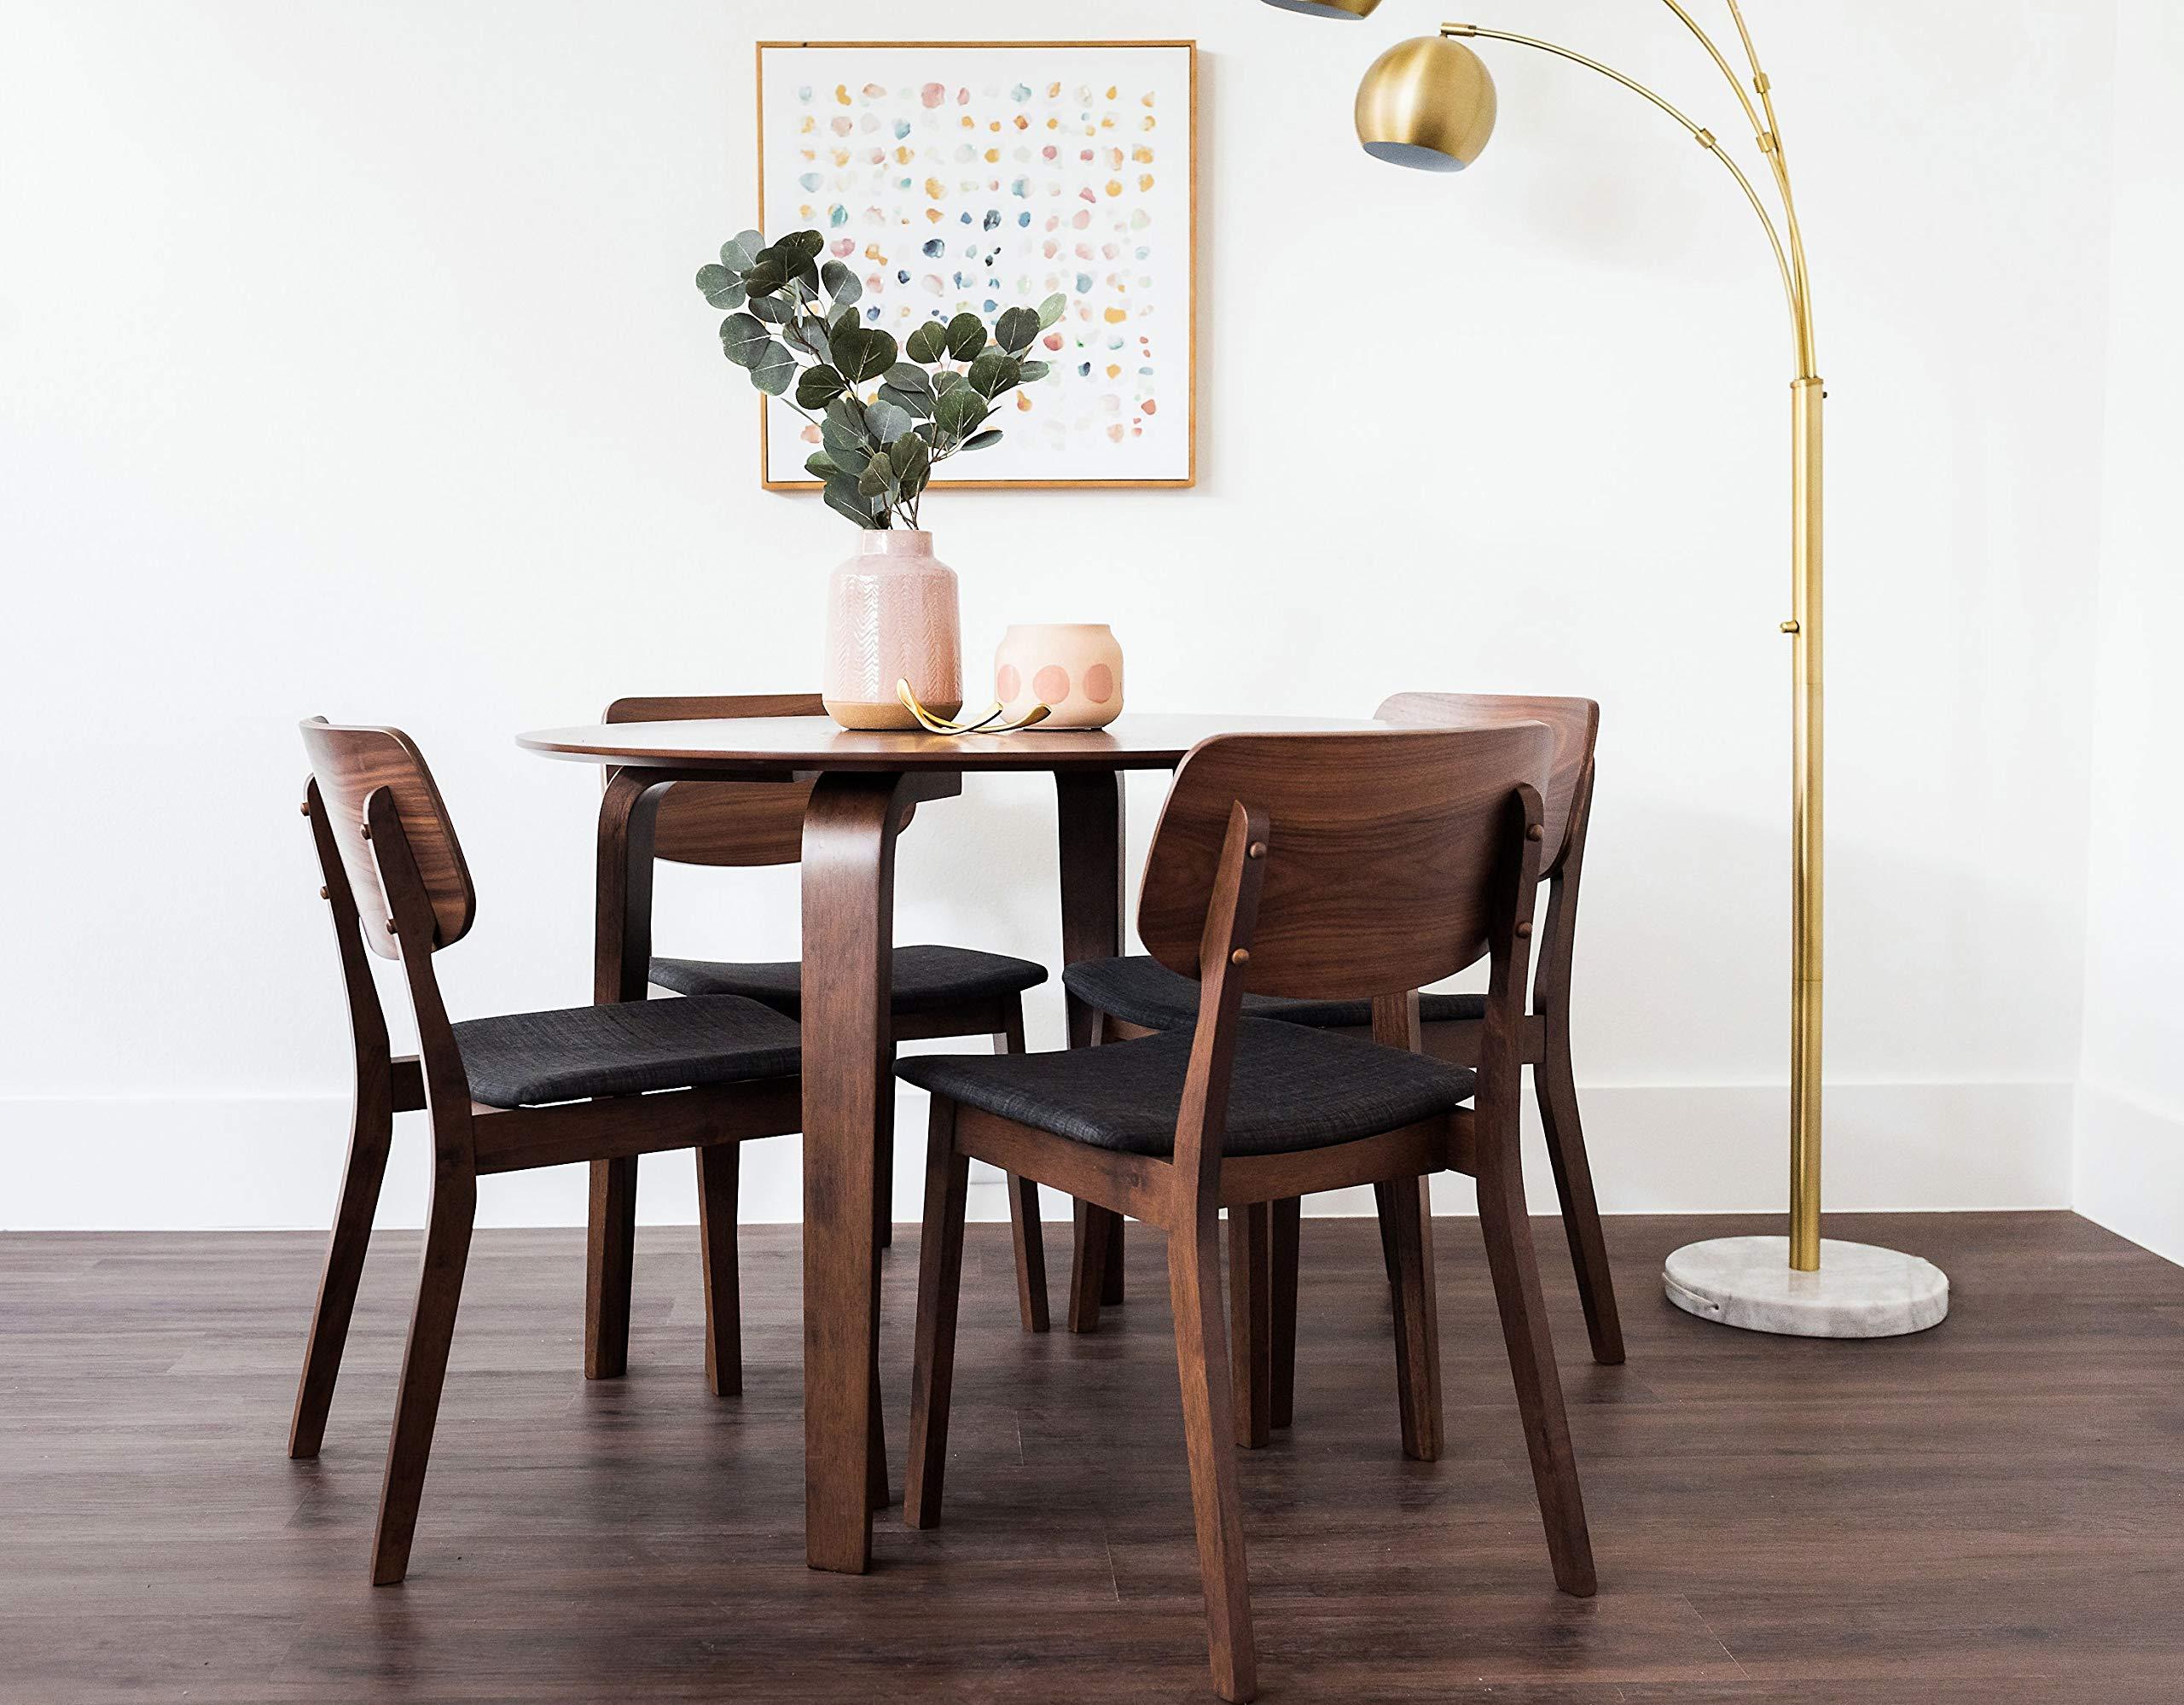 Edloe Finch YUMI Mid-Century Modern Round Dining Table Kitchen Walnut by Edloe Finch (Image #6)